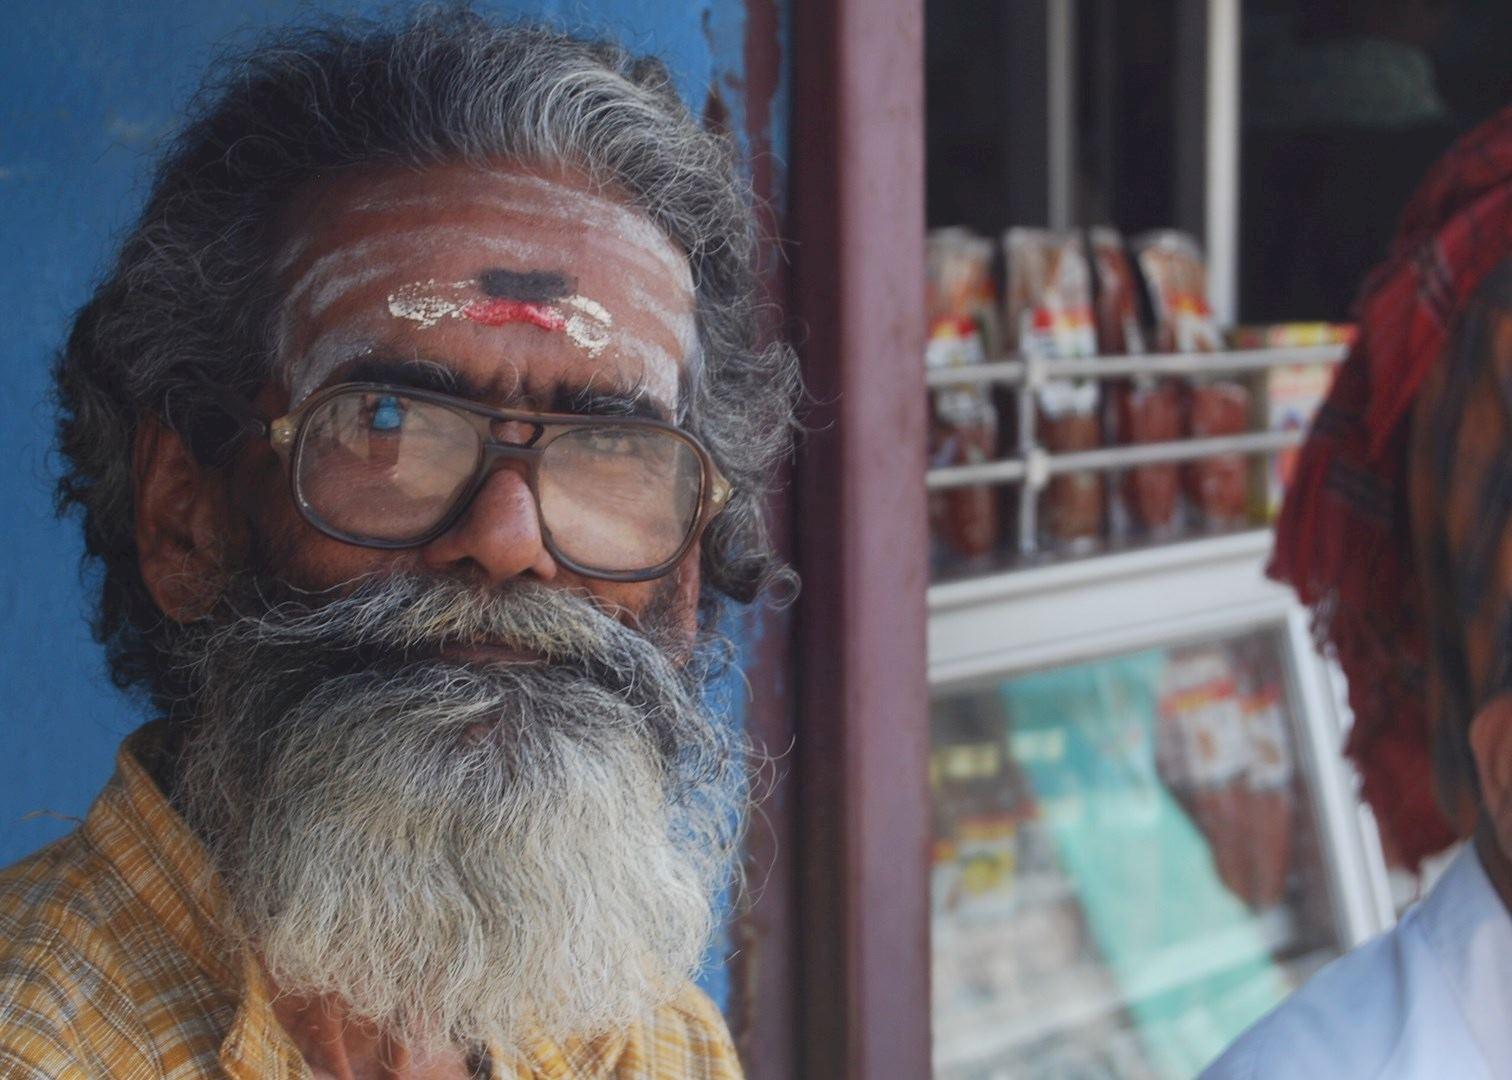 Palakkad India  city pictures gallery : Visit Palakkad, India